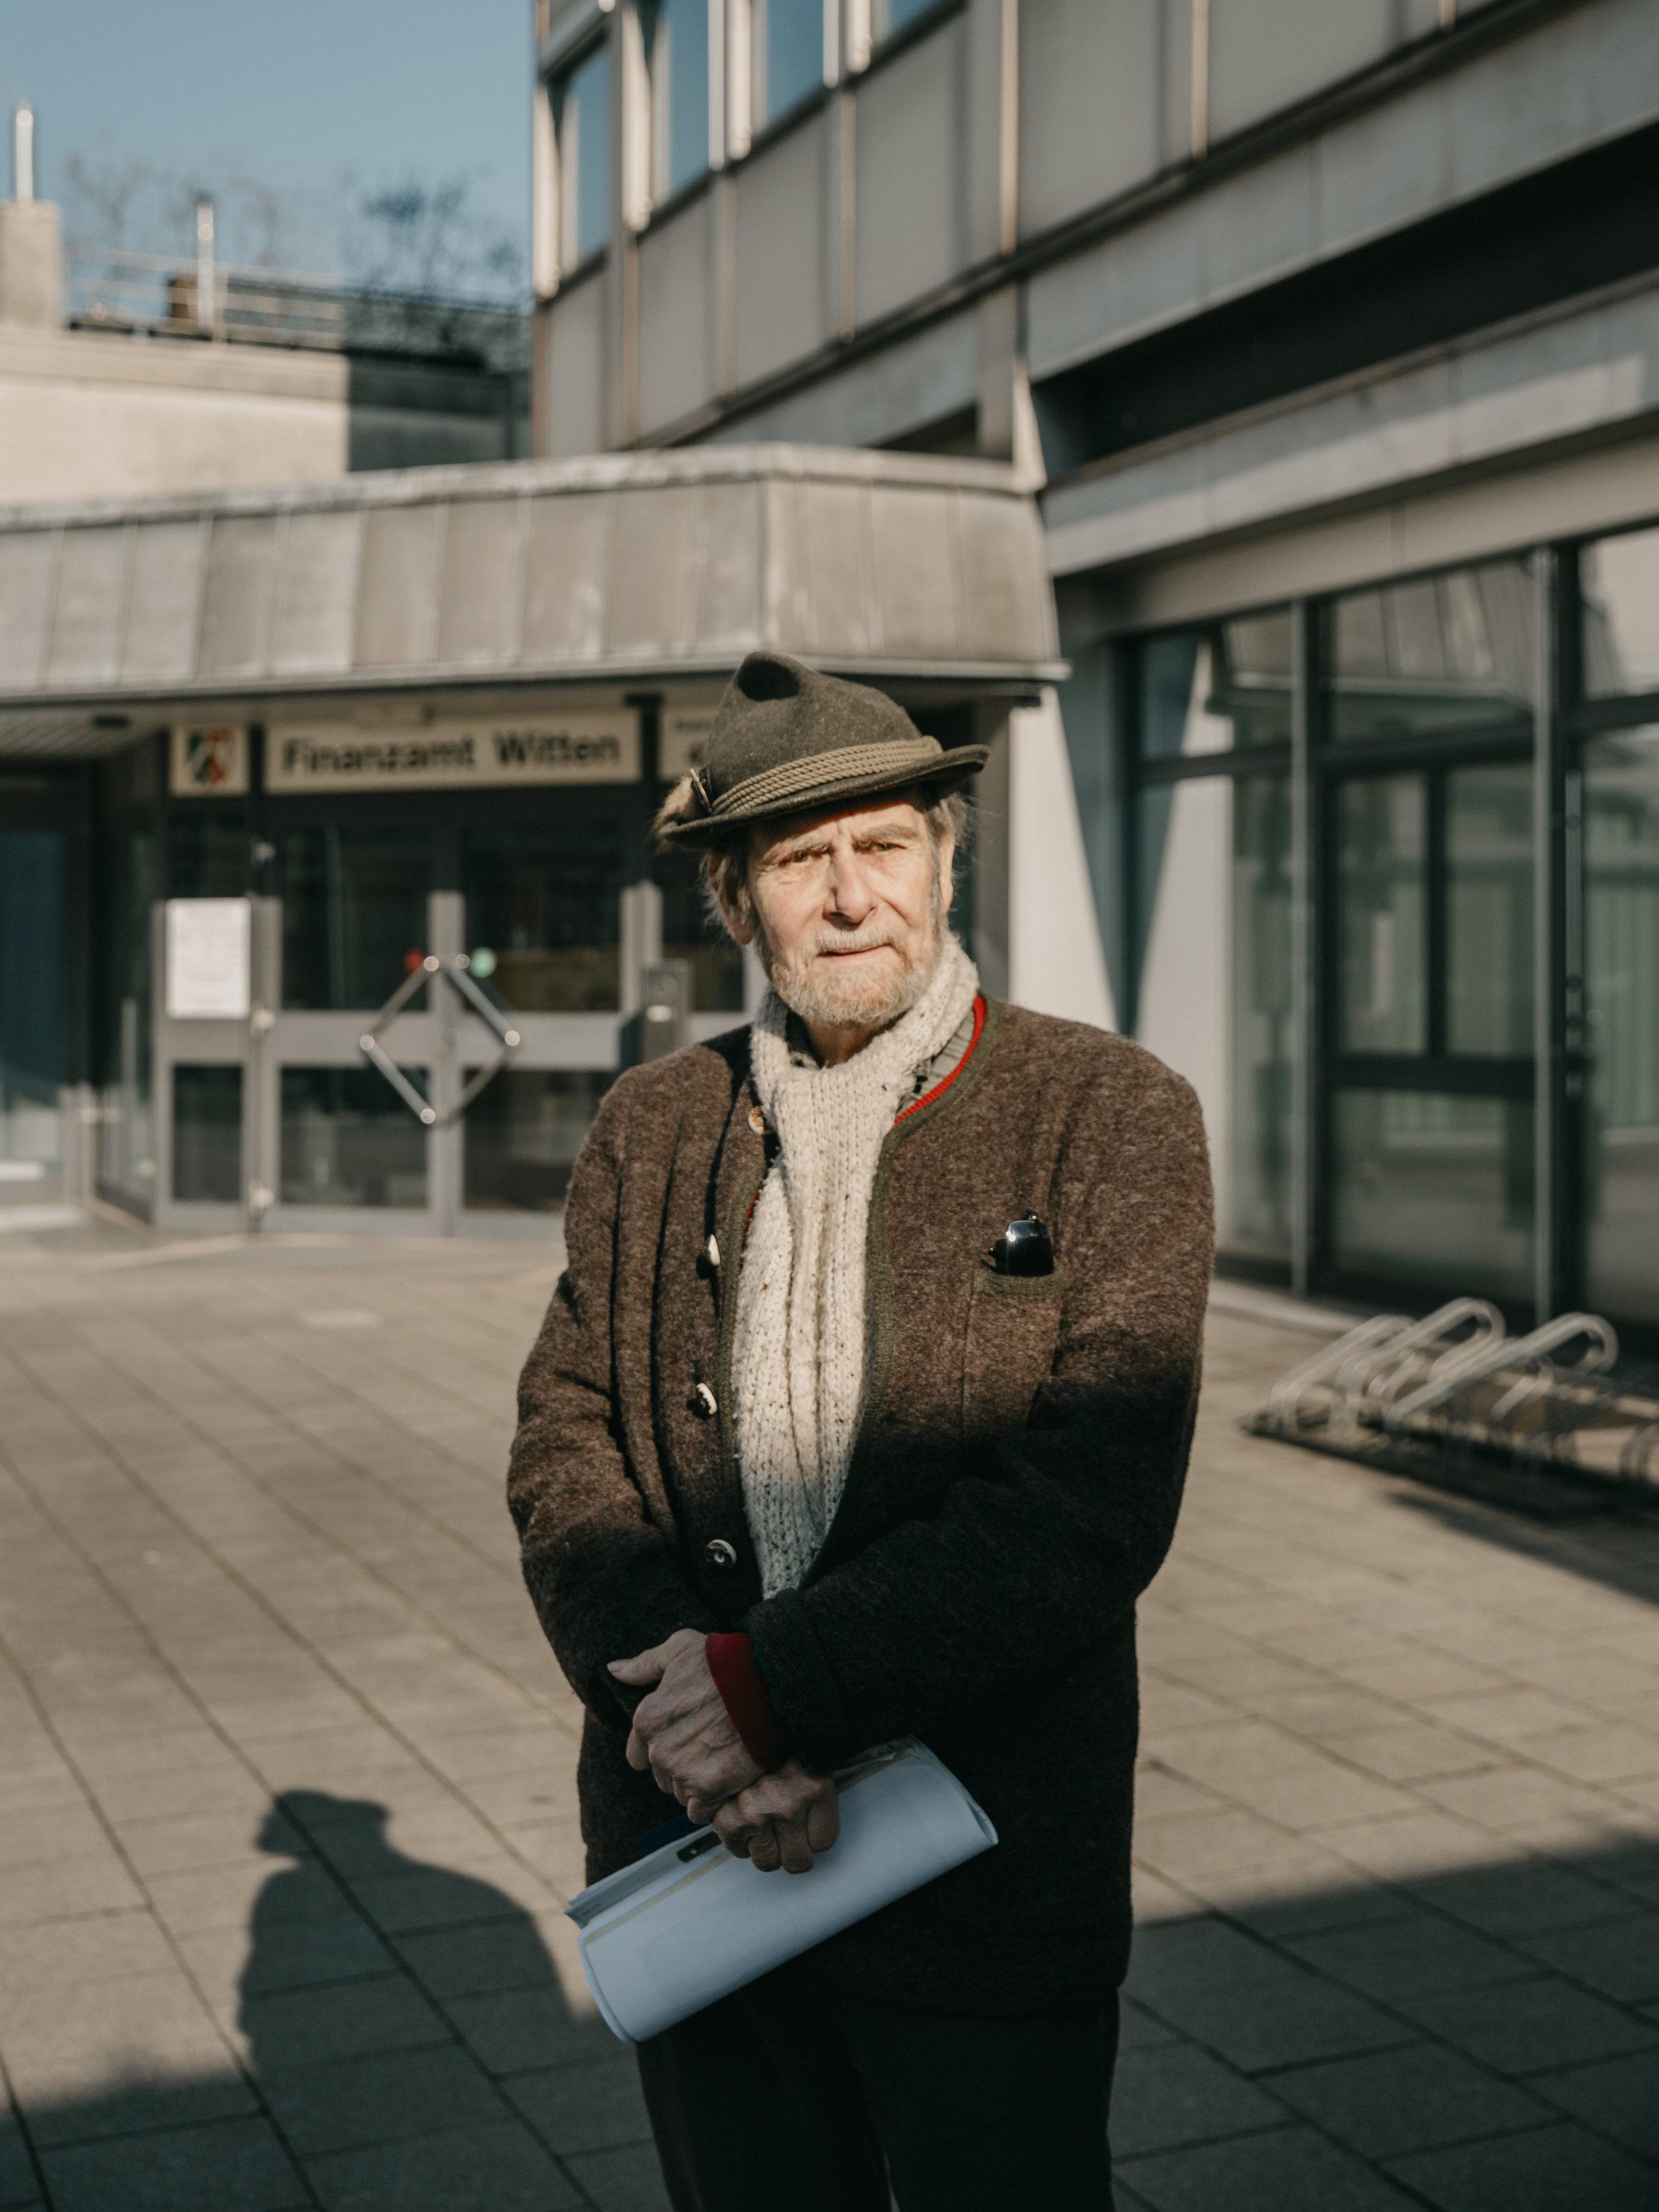 Steuerrebell Hans Rieschel klagt gegen die hohen Strafzinsen des Finanzamts. // Steuerrebell Hans Rieschel sues against the high penalty interest of the tax office.